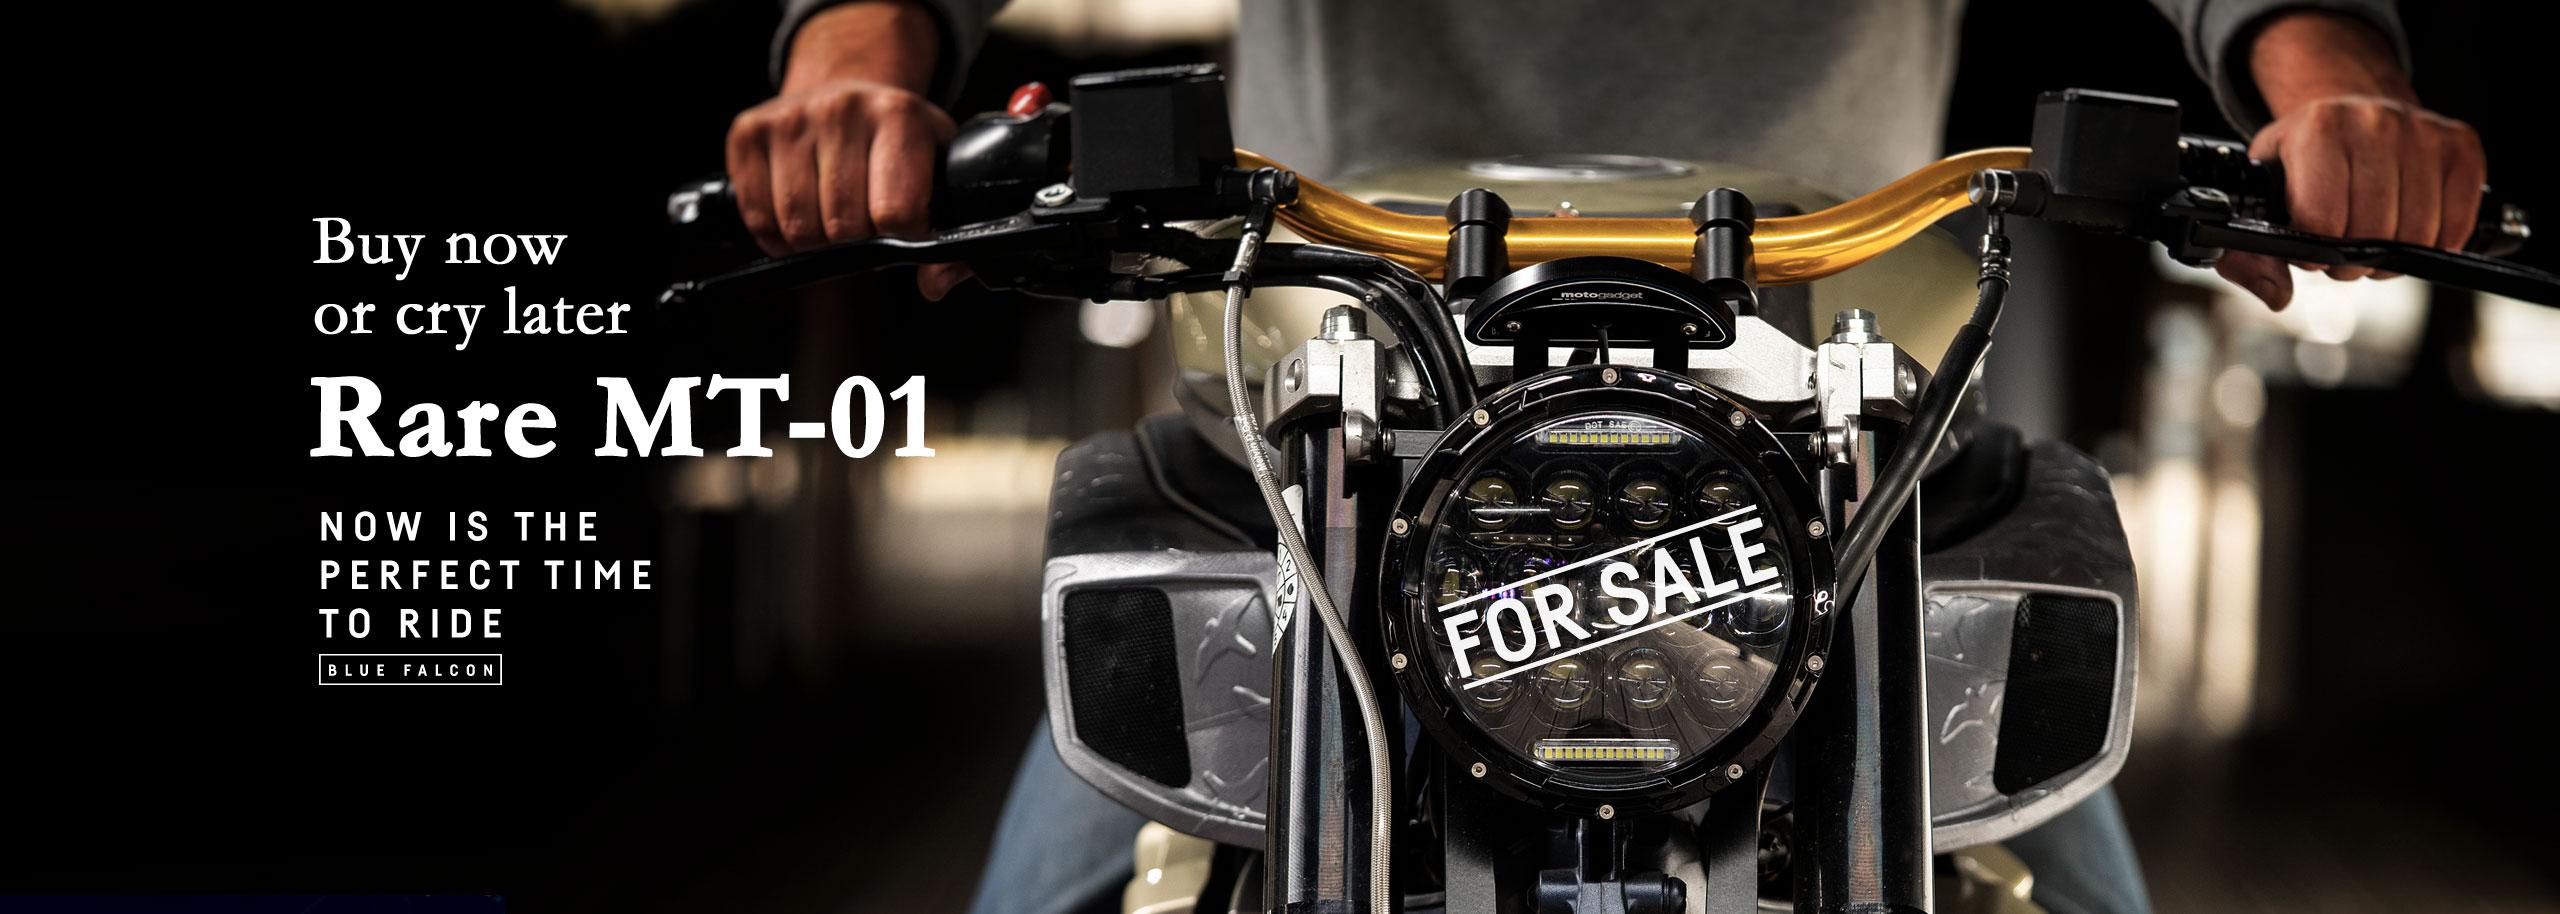 Custom-Bike-Austria-Graz-Cafe-Racer-Yamaha-MT-01-For-Sale-Einzelstück-Typisiert-TITAN